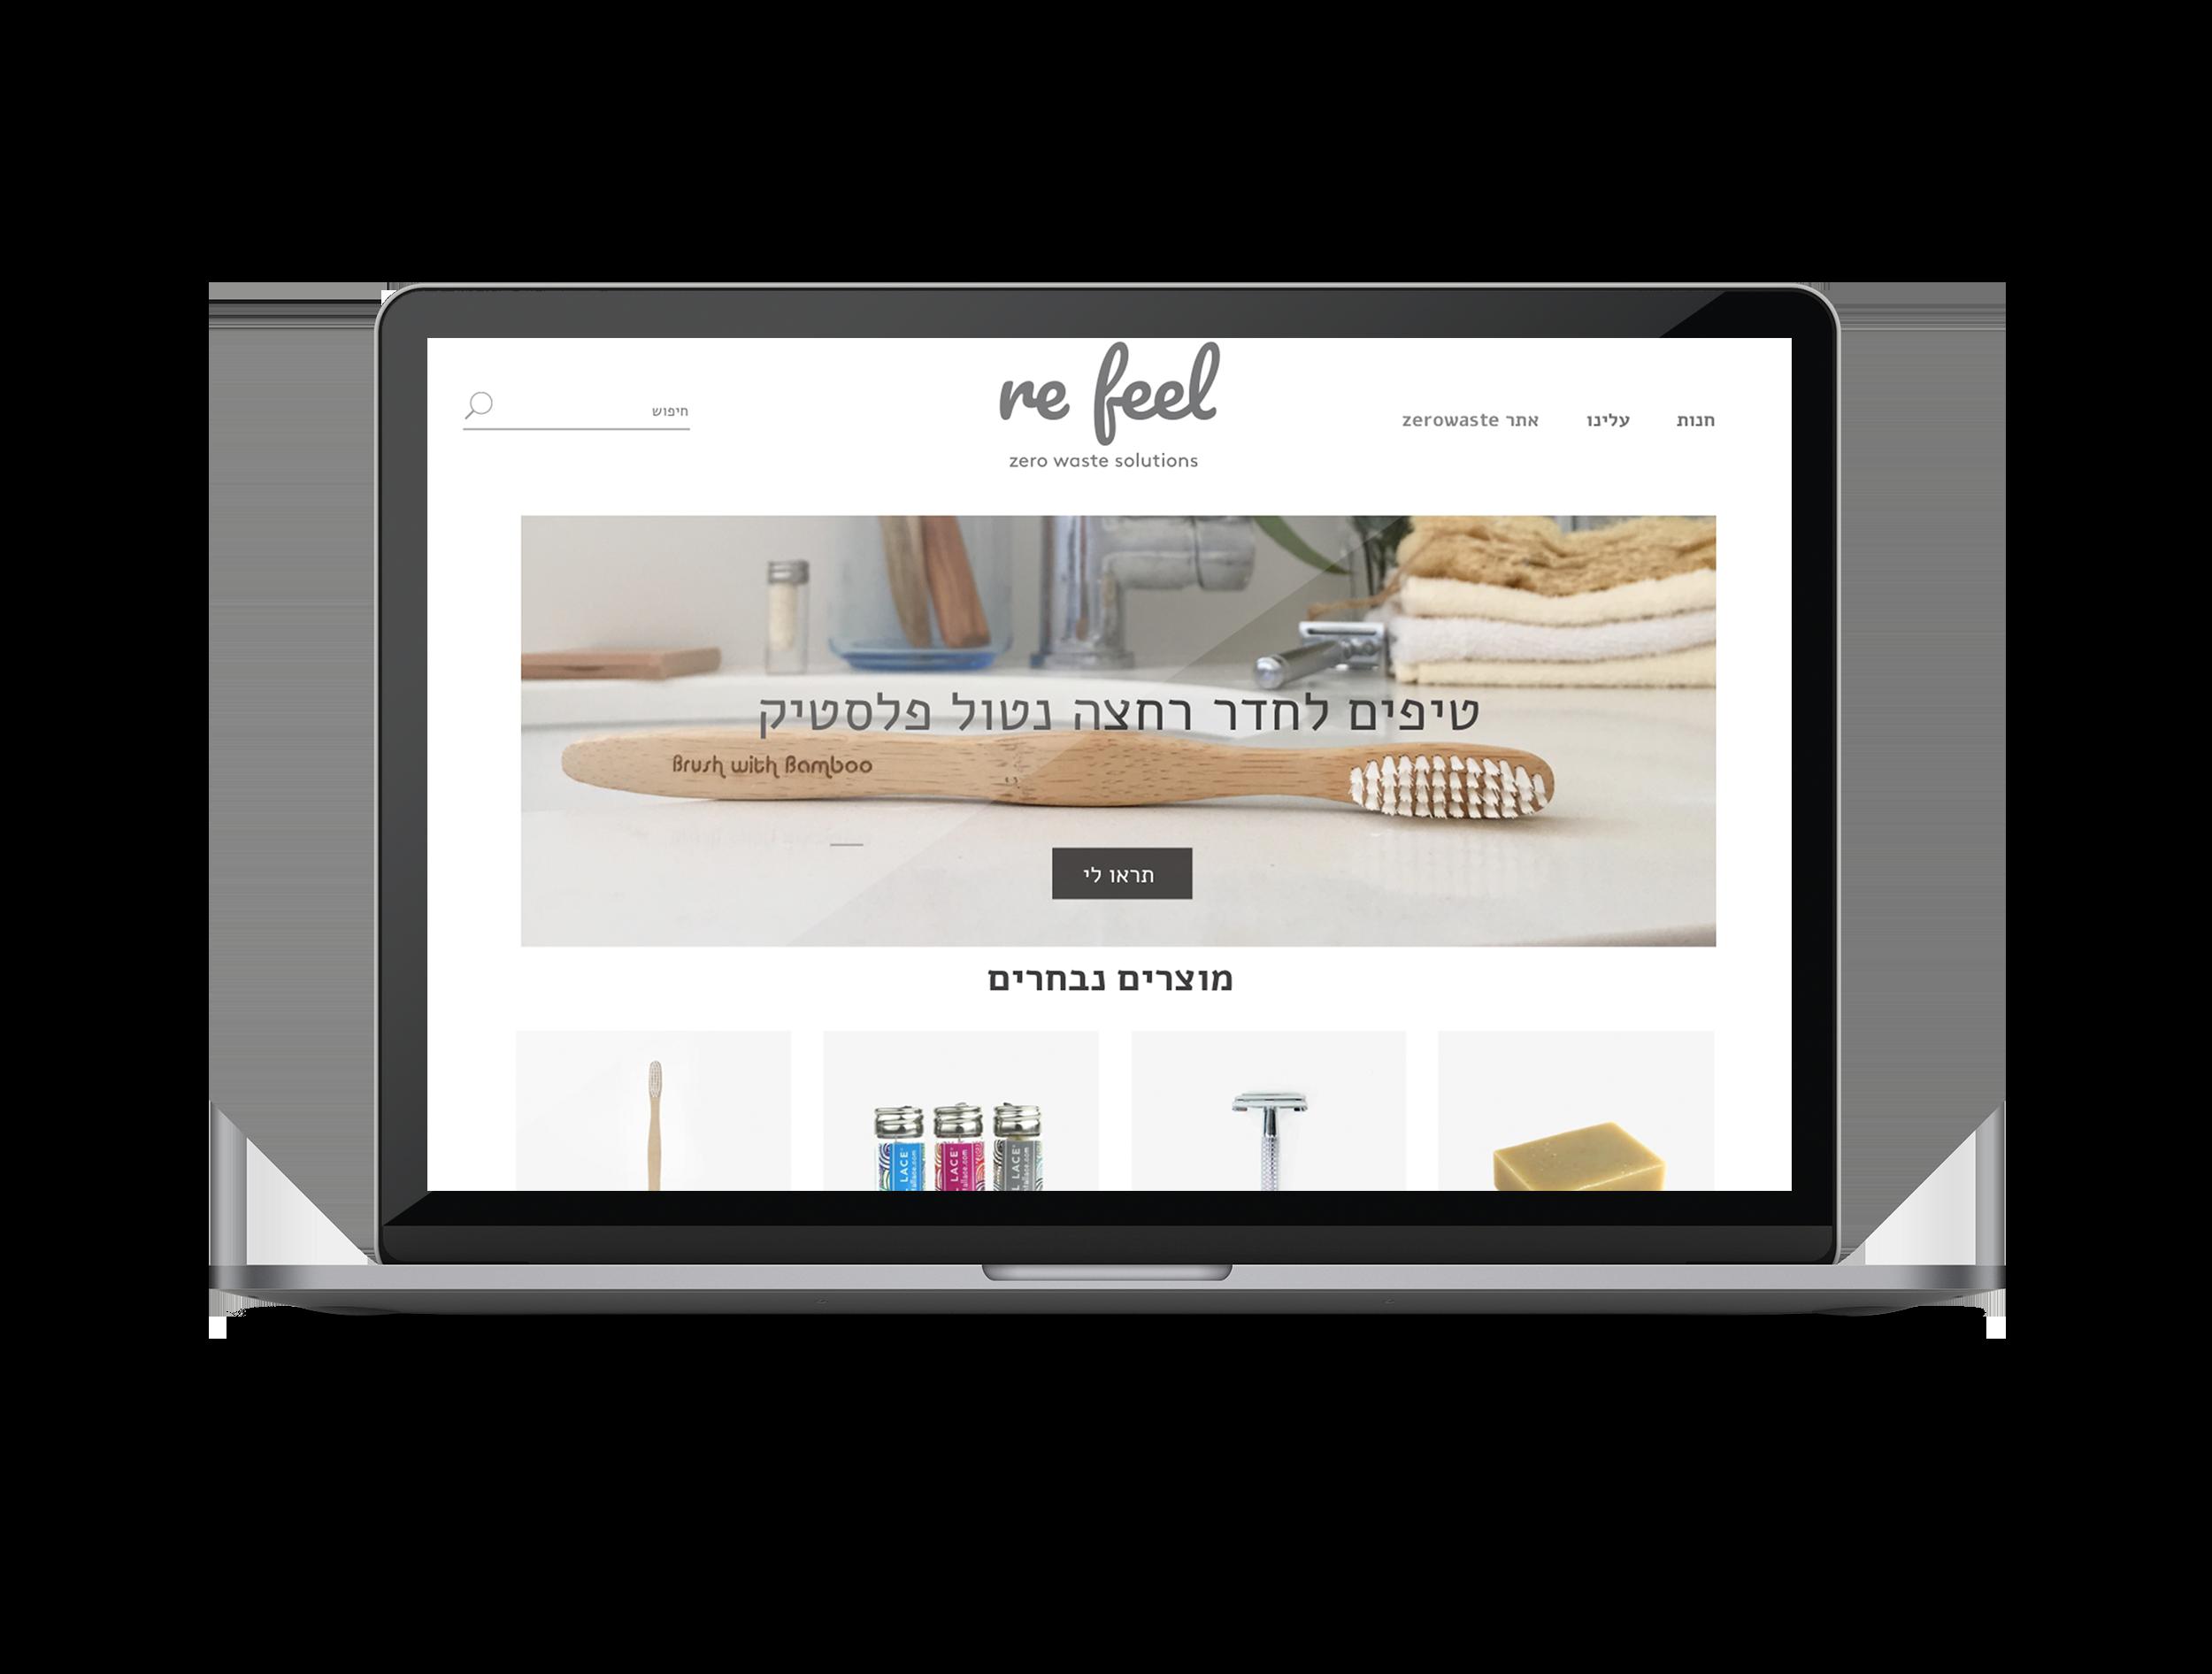 website refeel Design Mockup